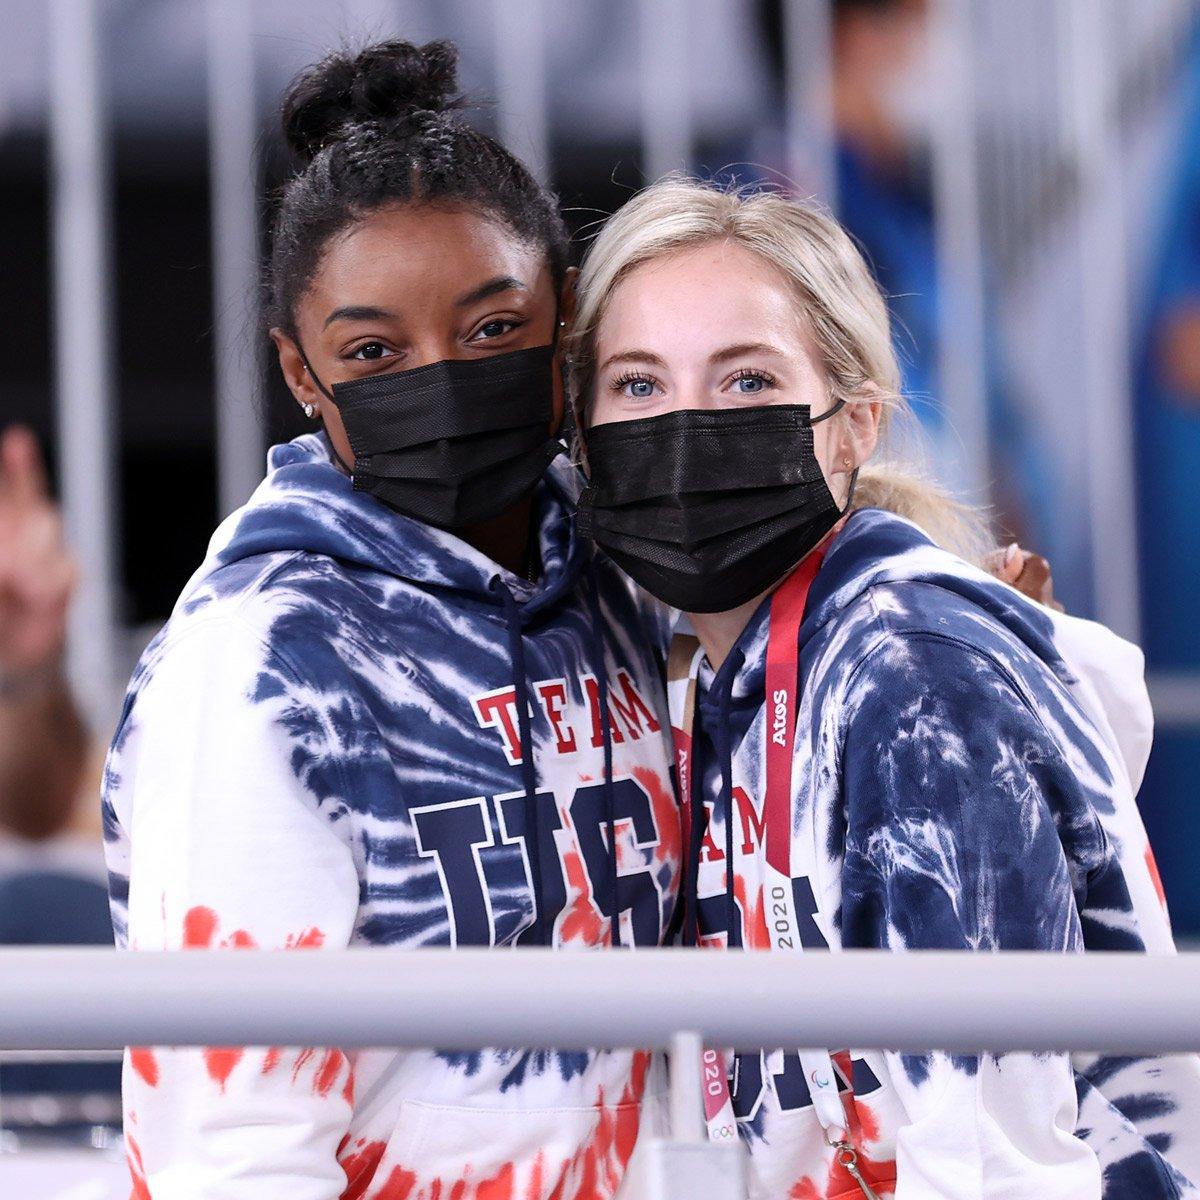 Simone Biles and MyKayla Skinner Support Team USA at Men's Gymnastics Final